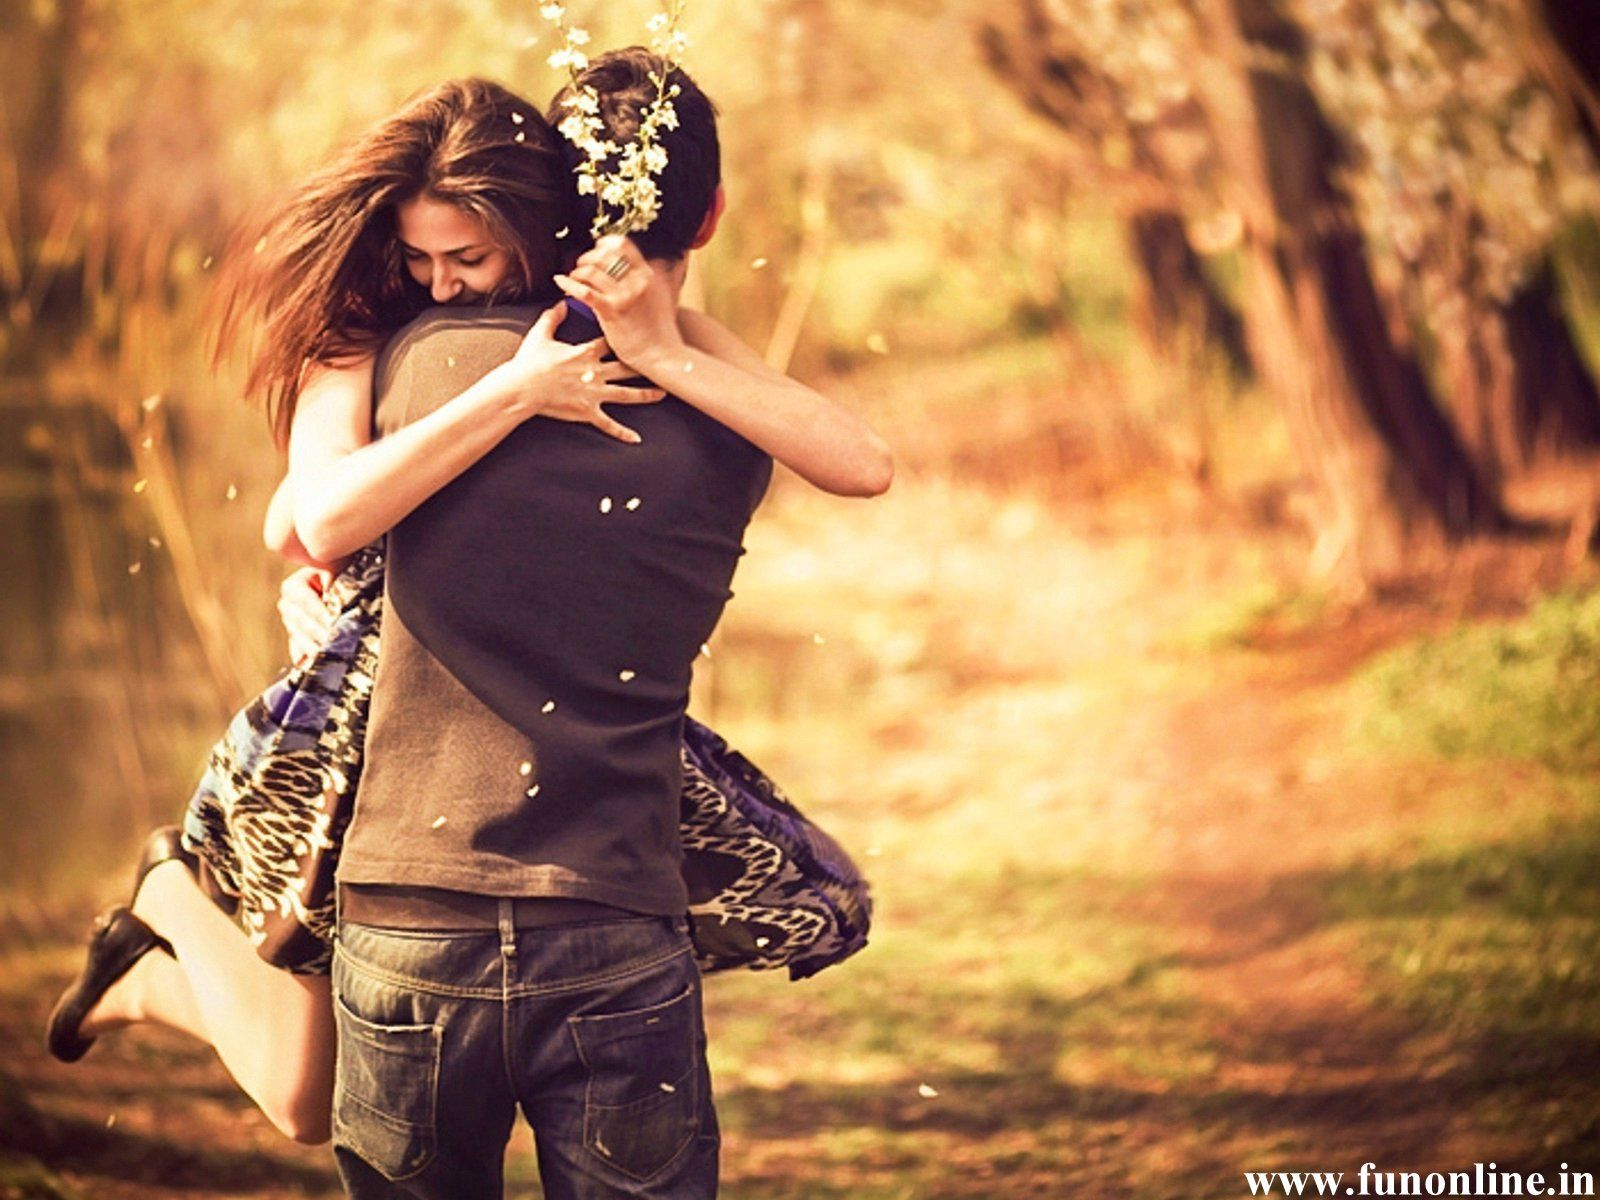 #love #colorful #couple #couplegoals #lovegoals #savethedate #happiness #memories #couplephotography #boyfriend #girlfriend #wife #kiss #hugg #longdistancerelationship #relationship